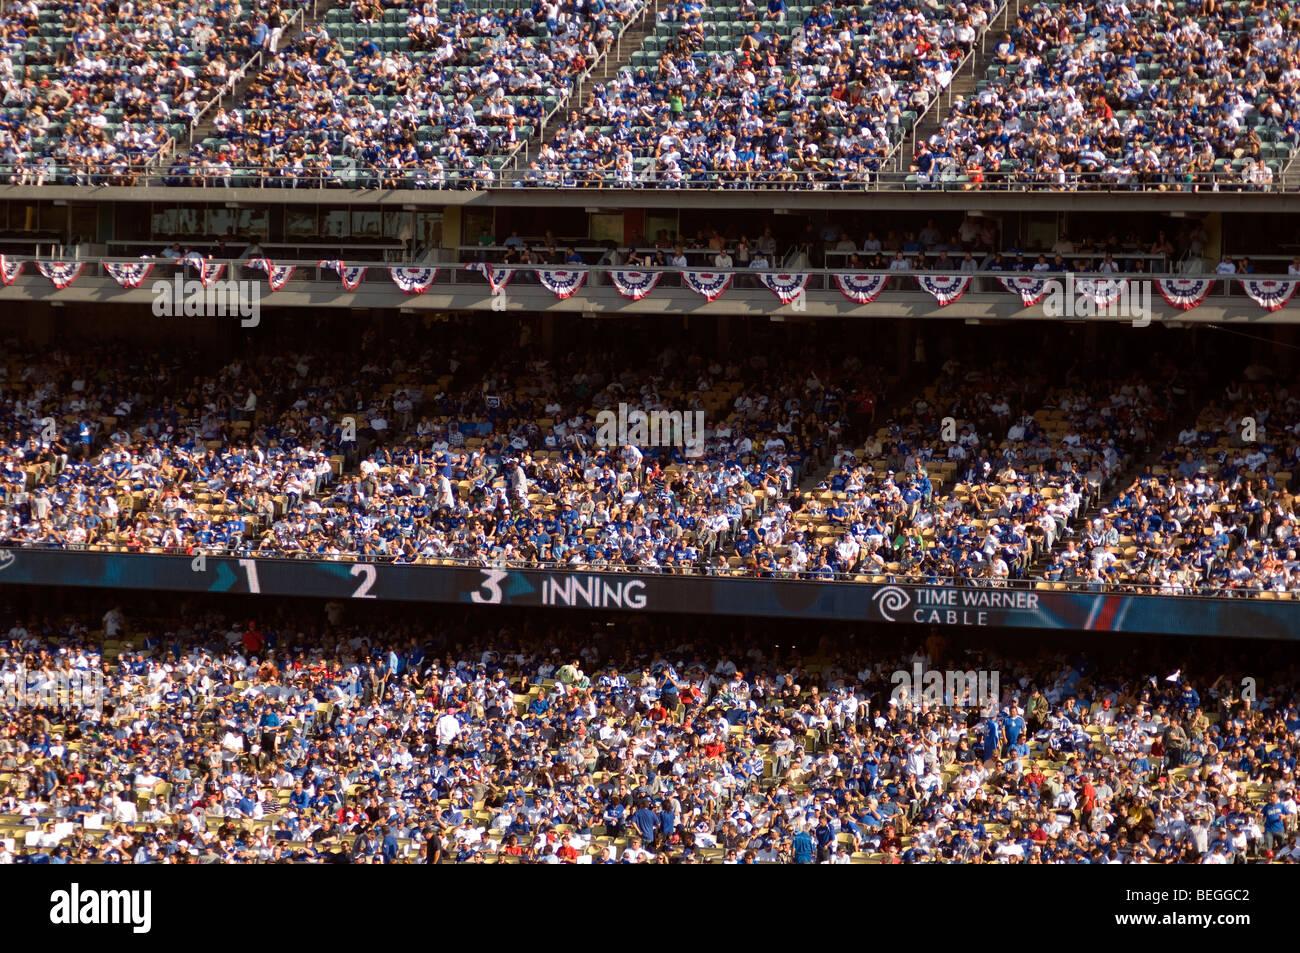 Crowd at Dodger Stadium - Stock Image